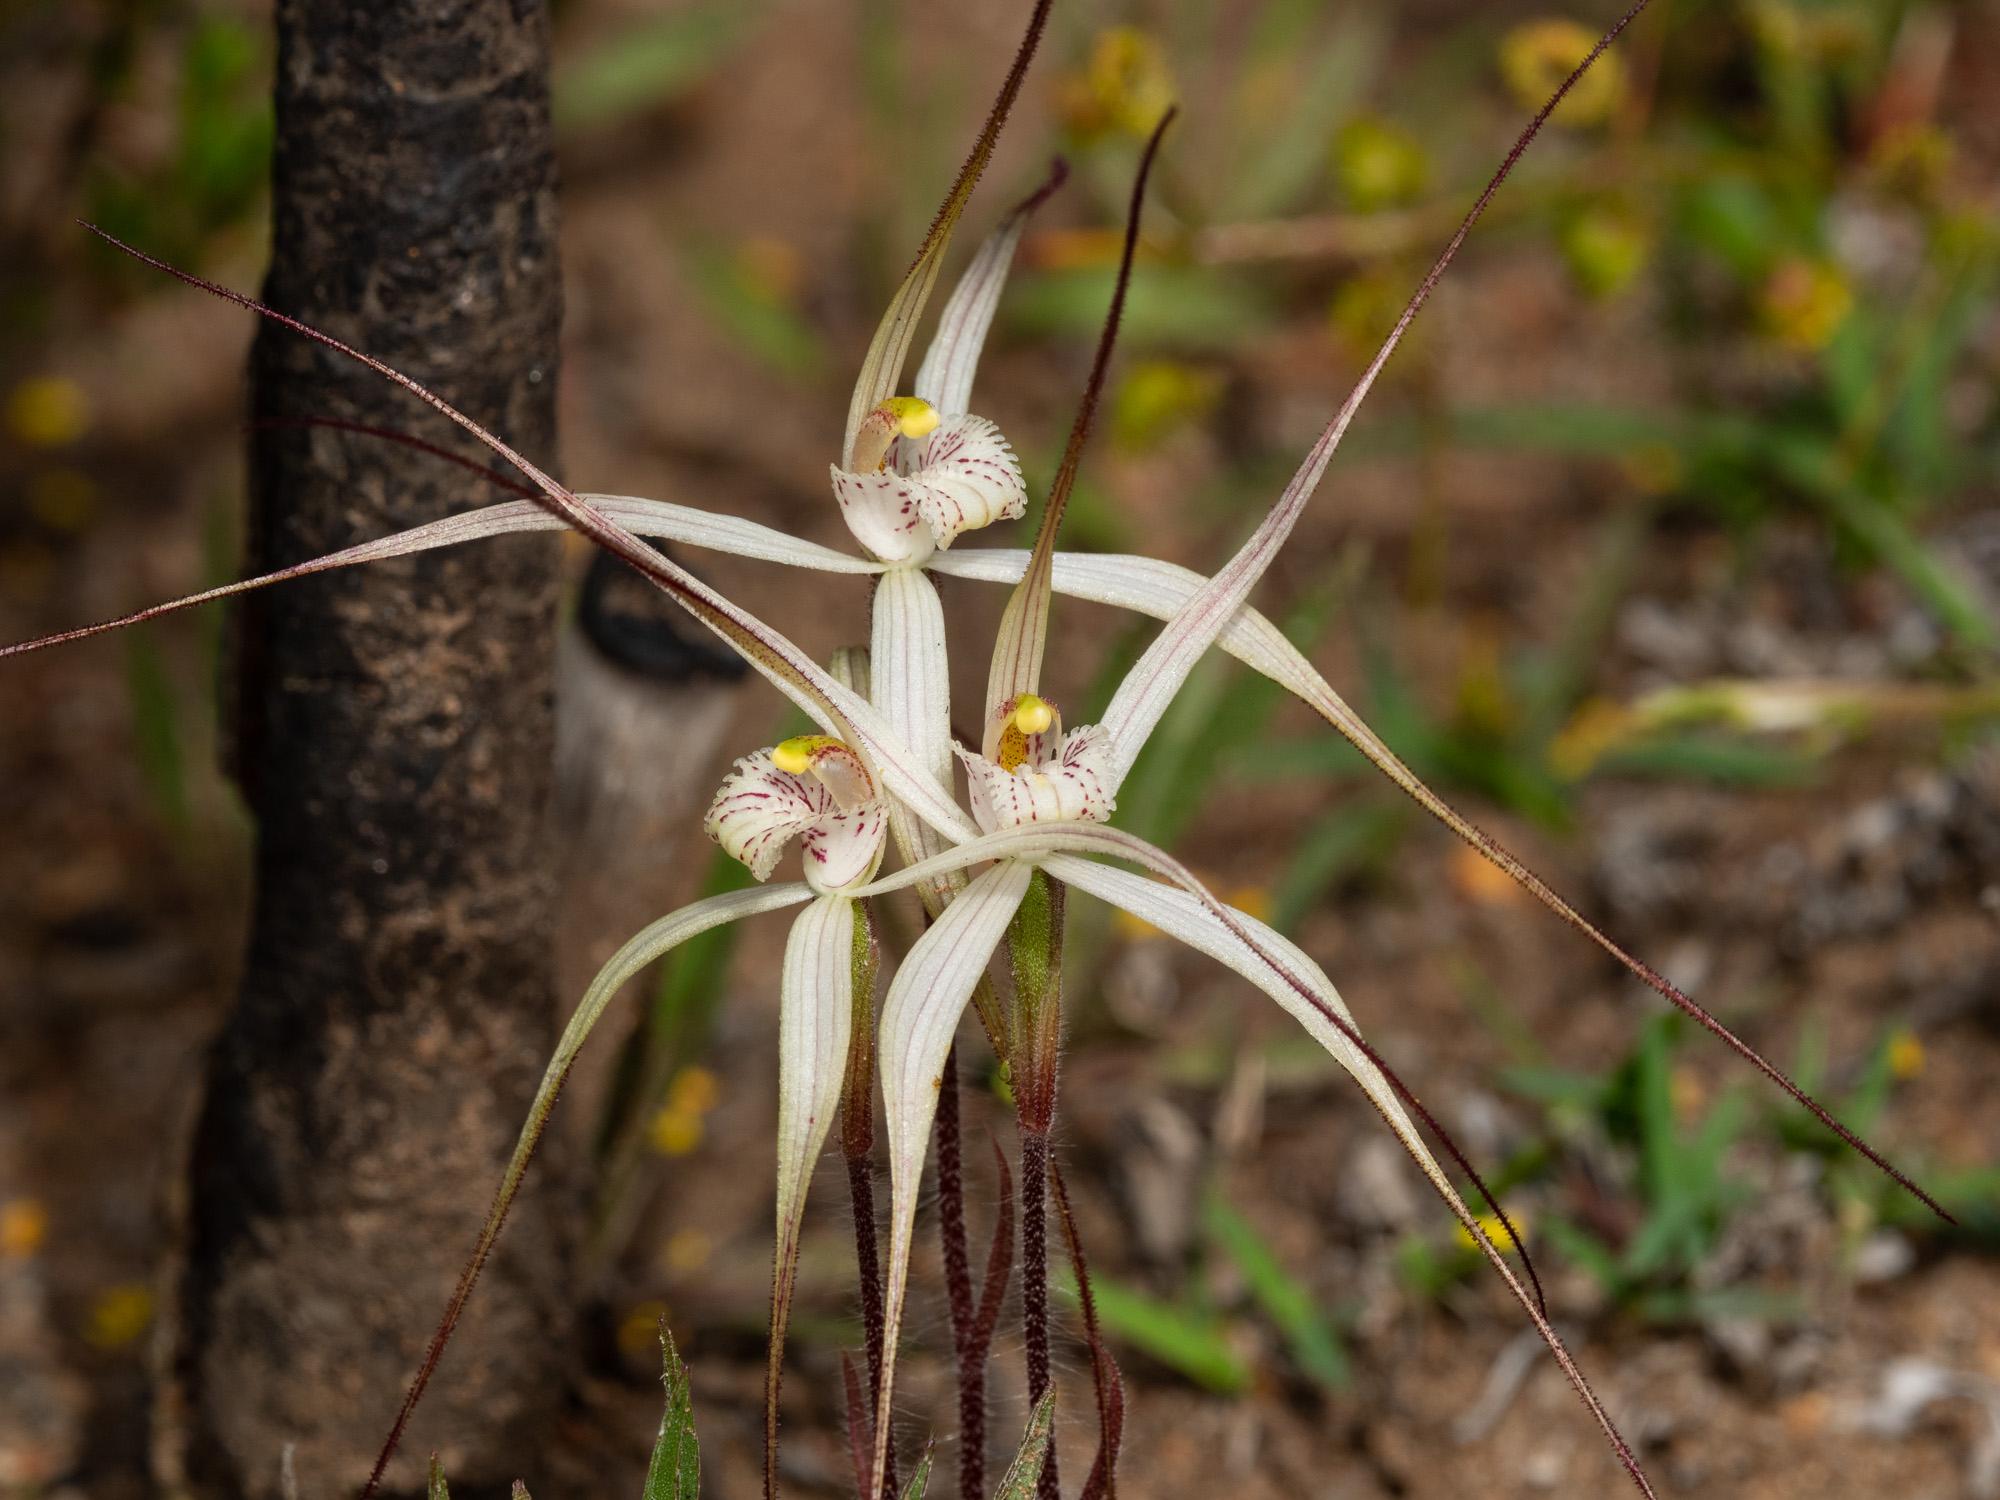 Caladenia microchila (Western Whispy Spider Orchid)